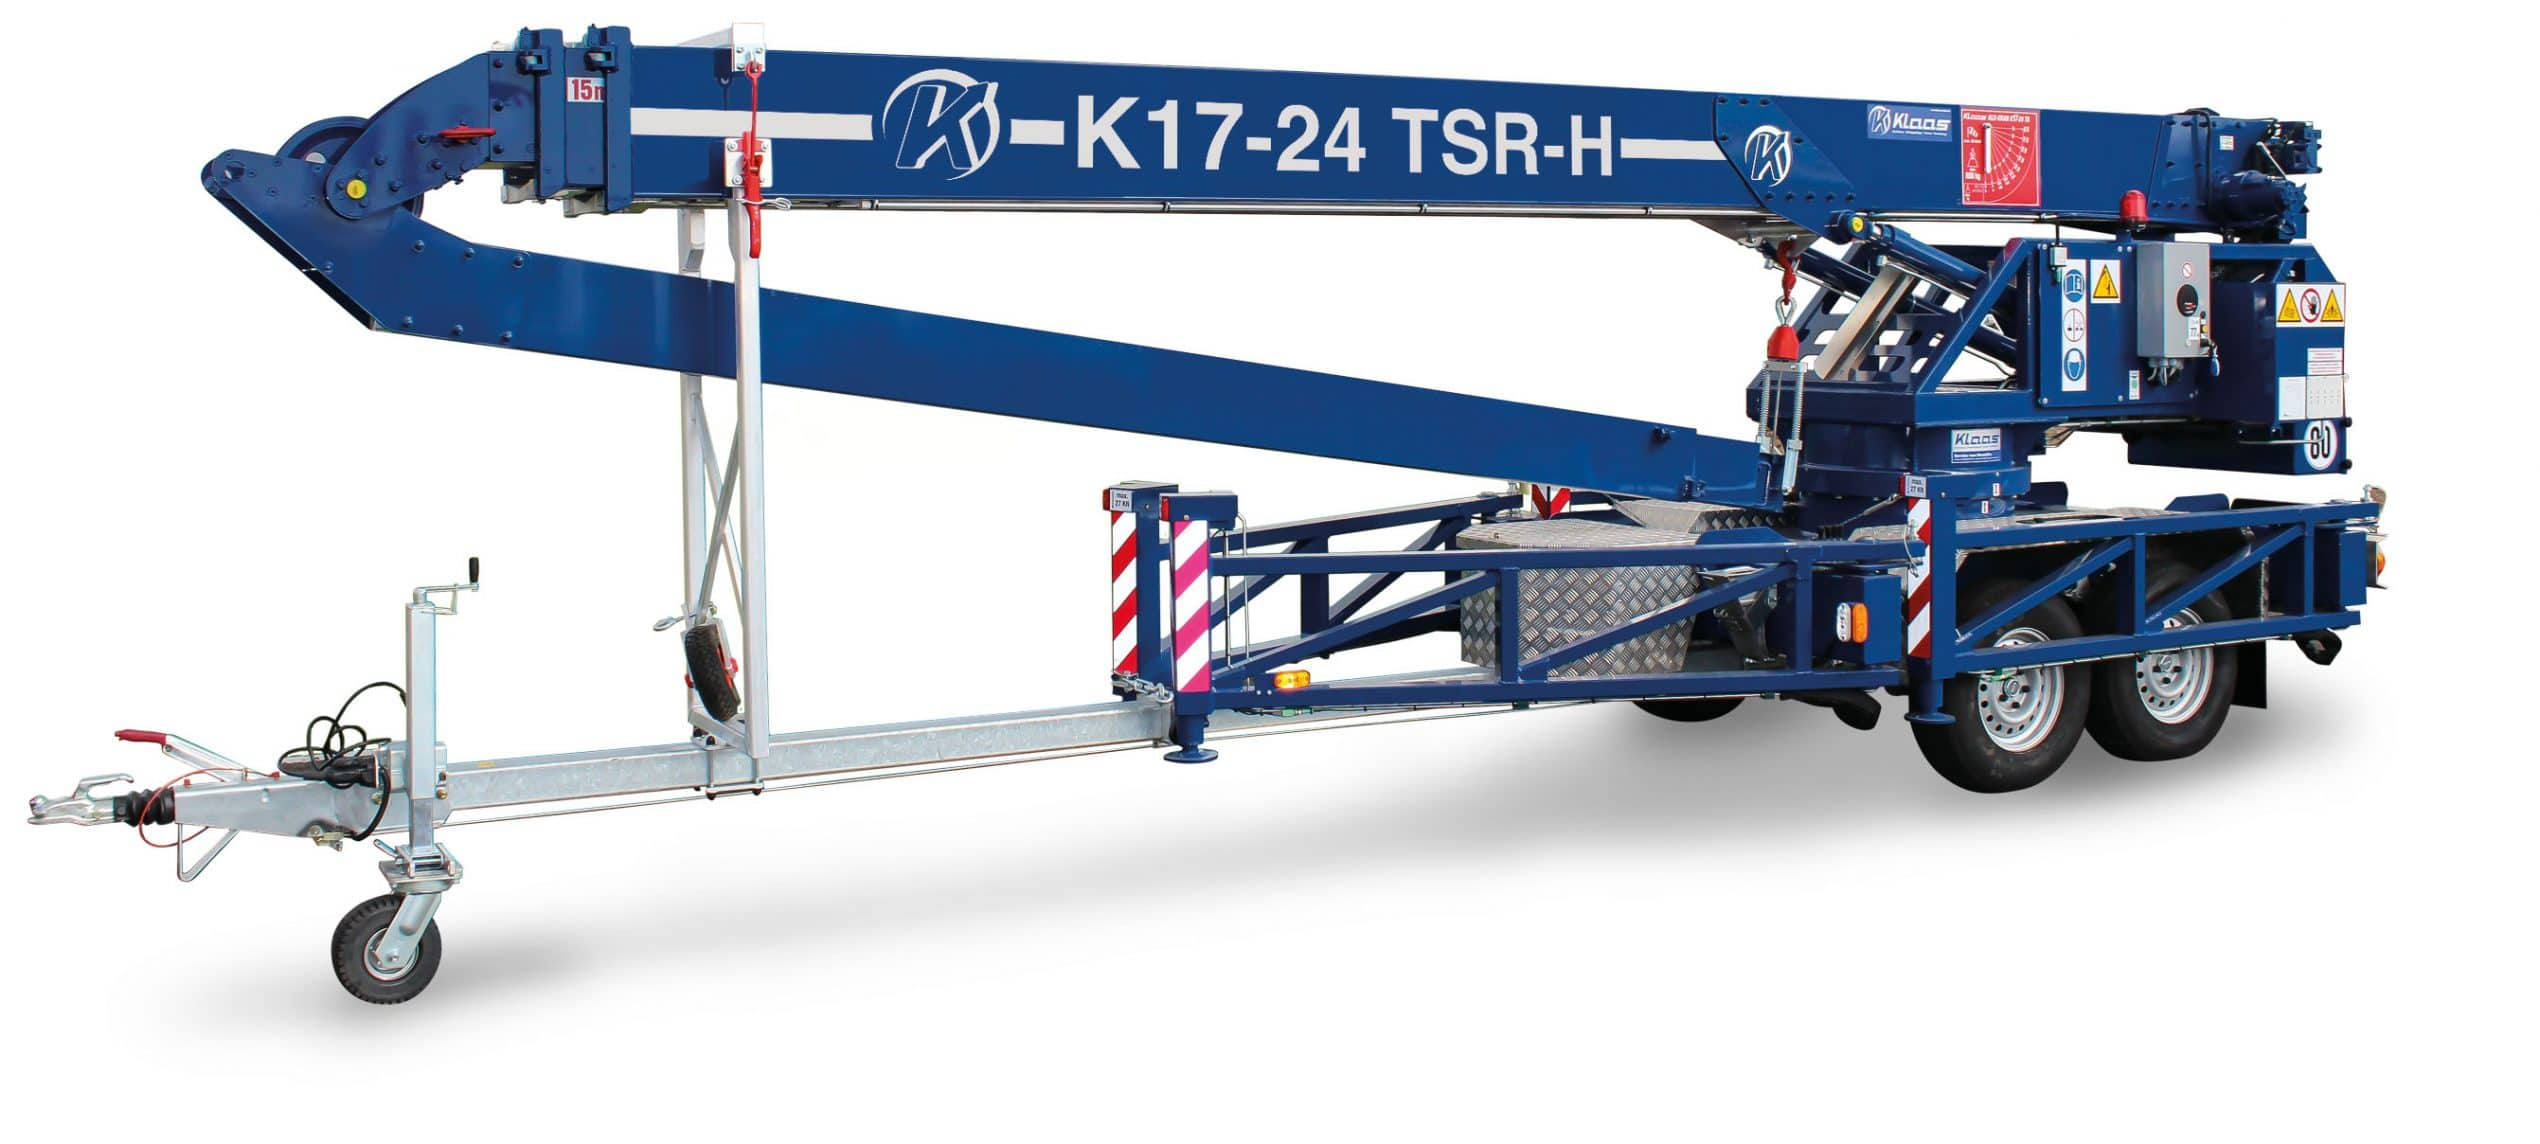 k17-24tsr-h_slider2